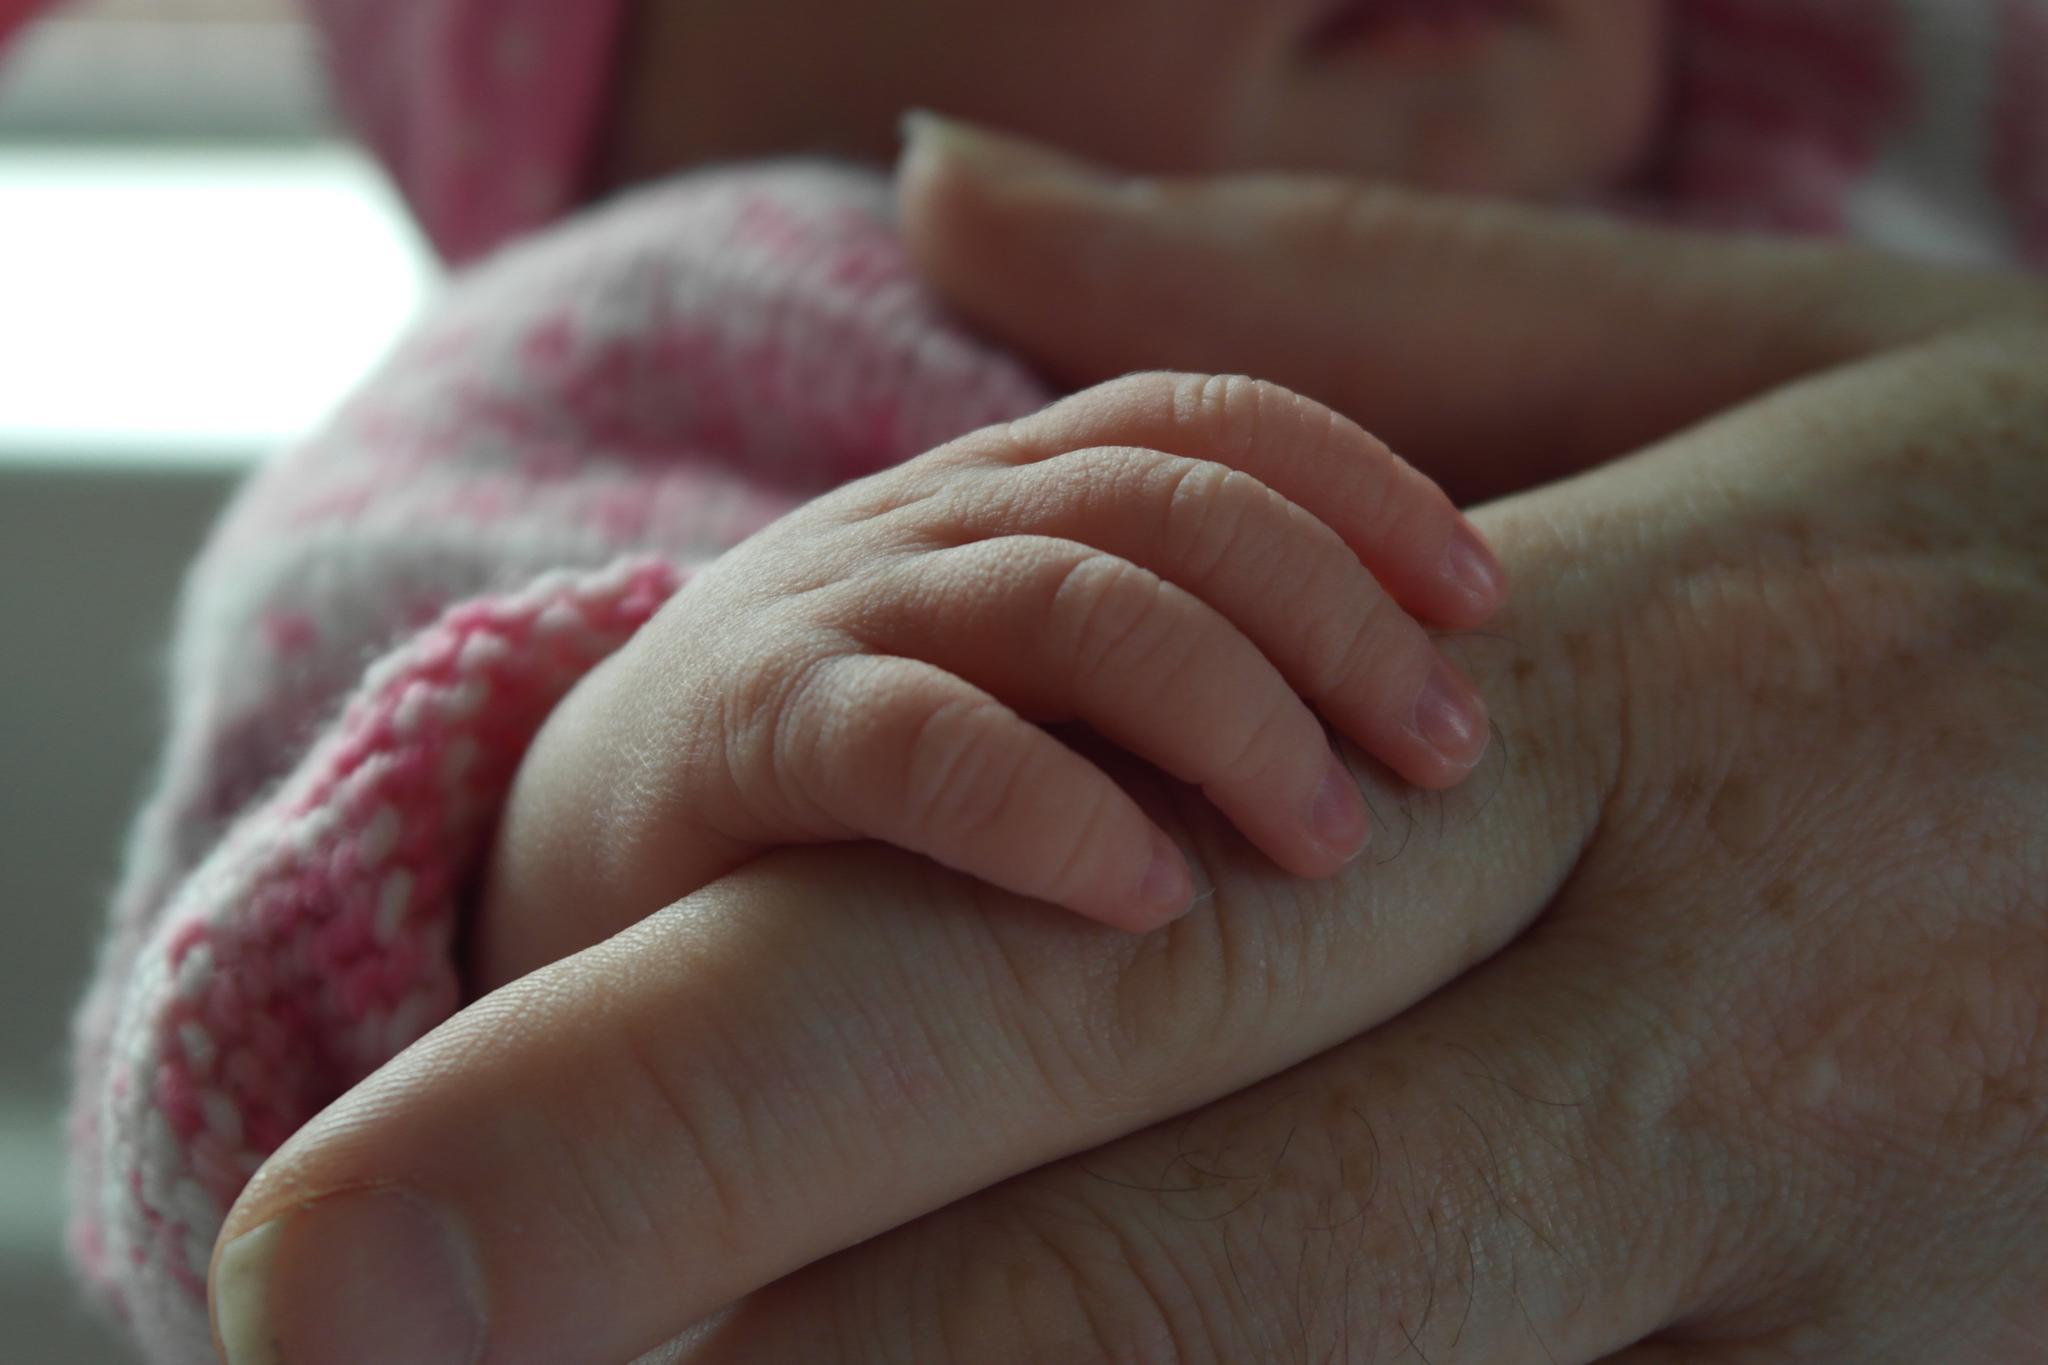 Tiny Fingers by tony.crawford4